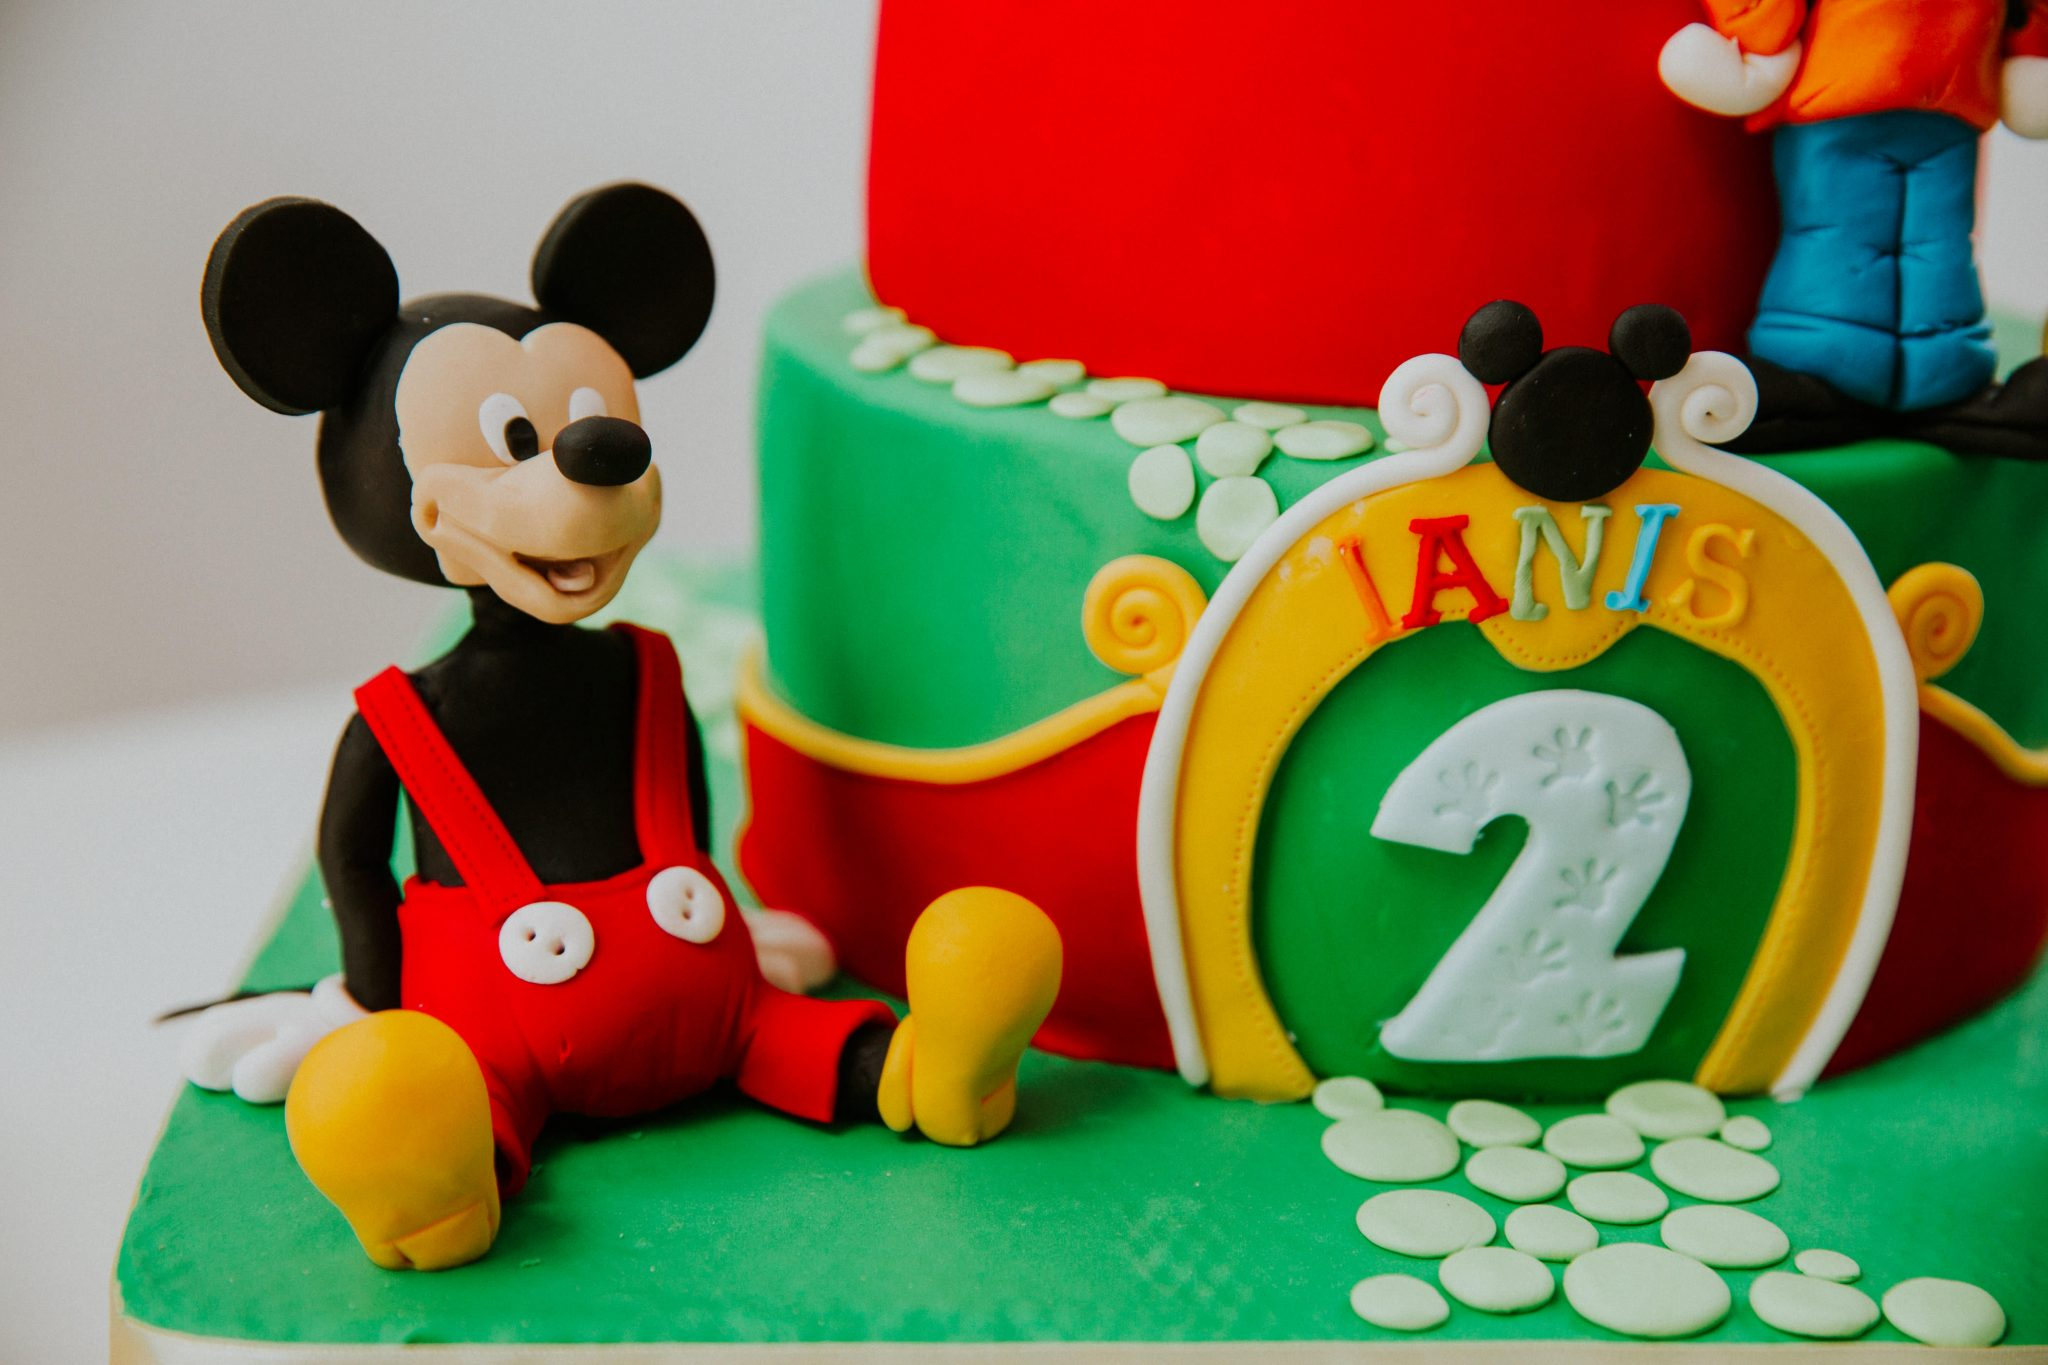 fotografie-comerciala-pentru-firme-barbaras-cakes-cofetarie-targu-mures-foto-majos-daniel-4